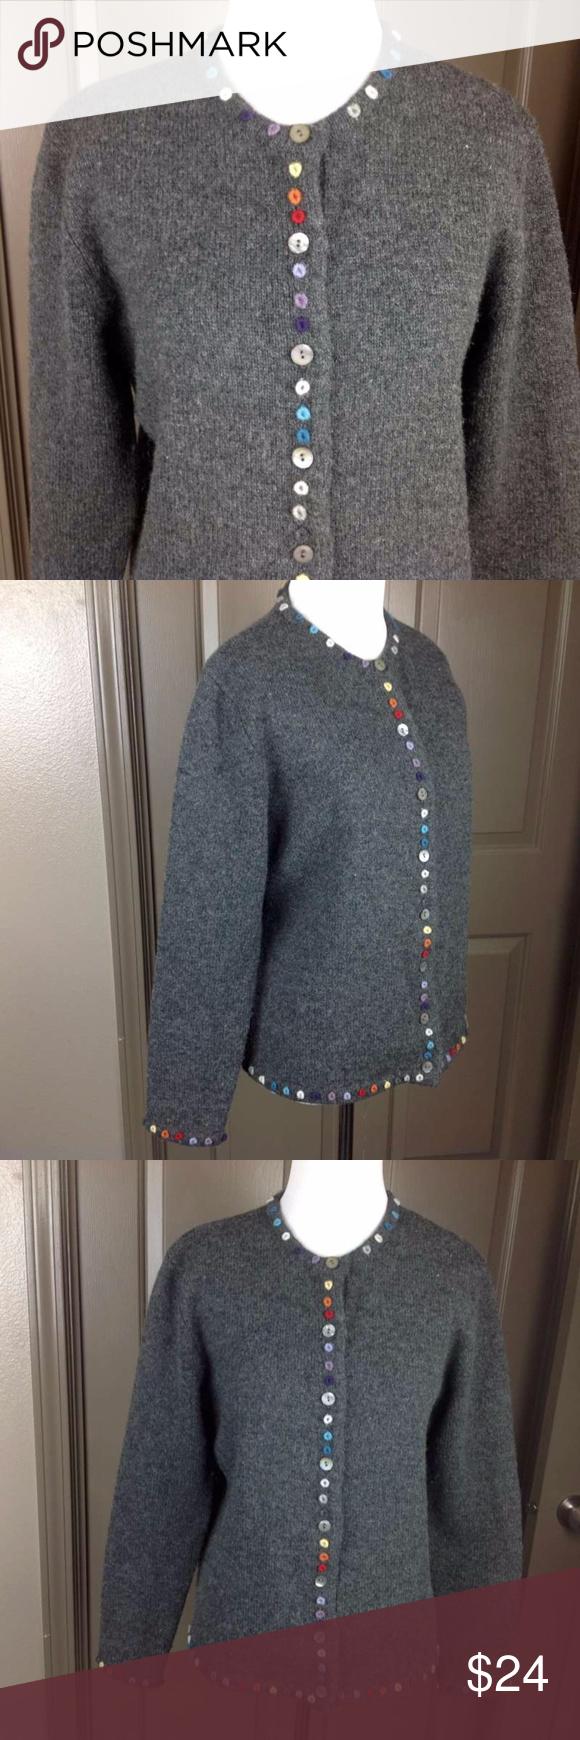 Jillian Jones Sweater Small Cardigan 100% Wool | Craft